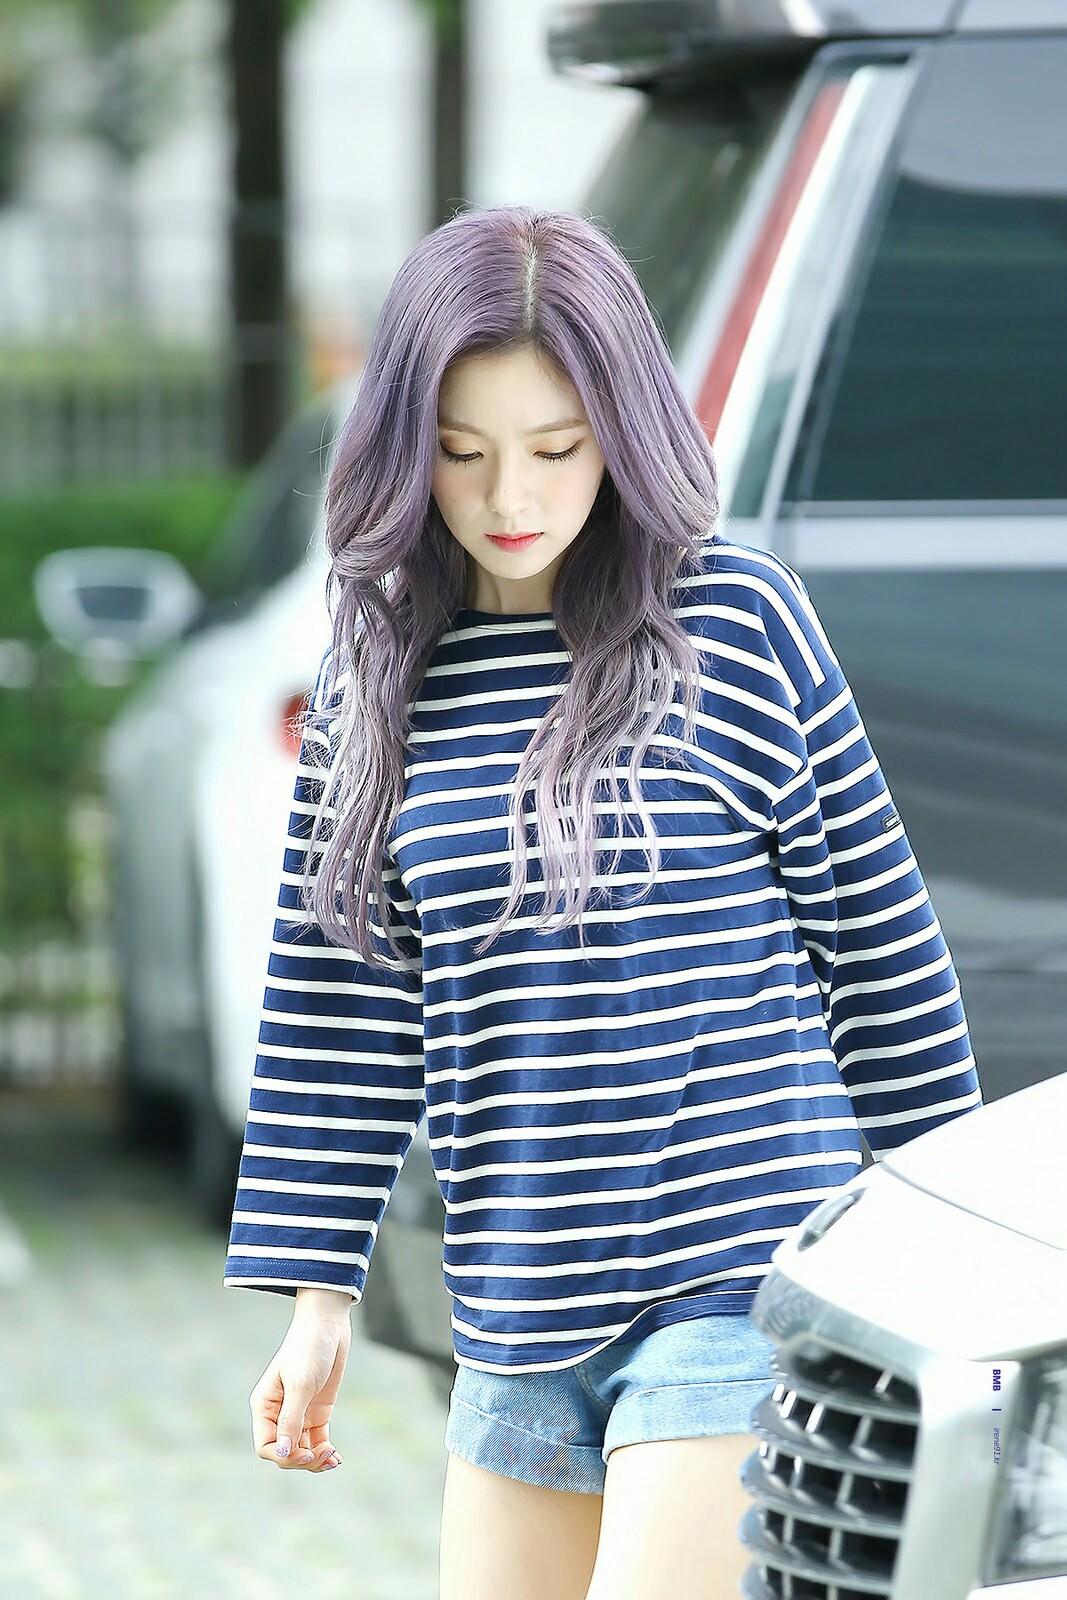 Red Velvetアイリーンの髪色が紫でカワイイ!ヘアカラーを真似したい! 韓流diary